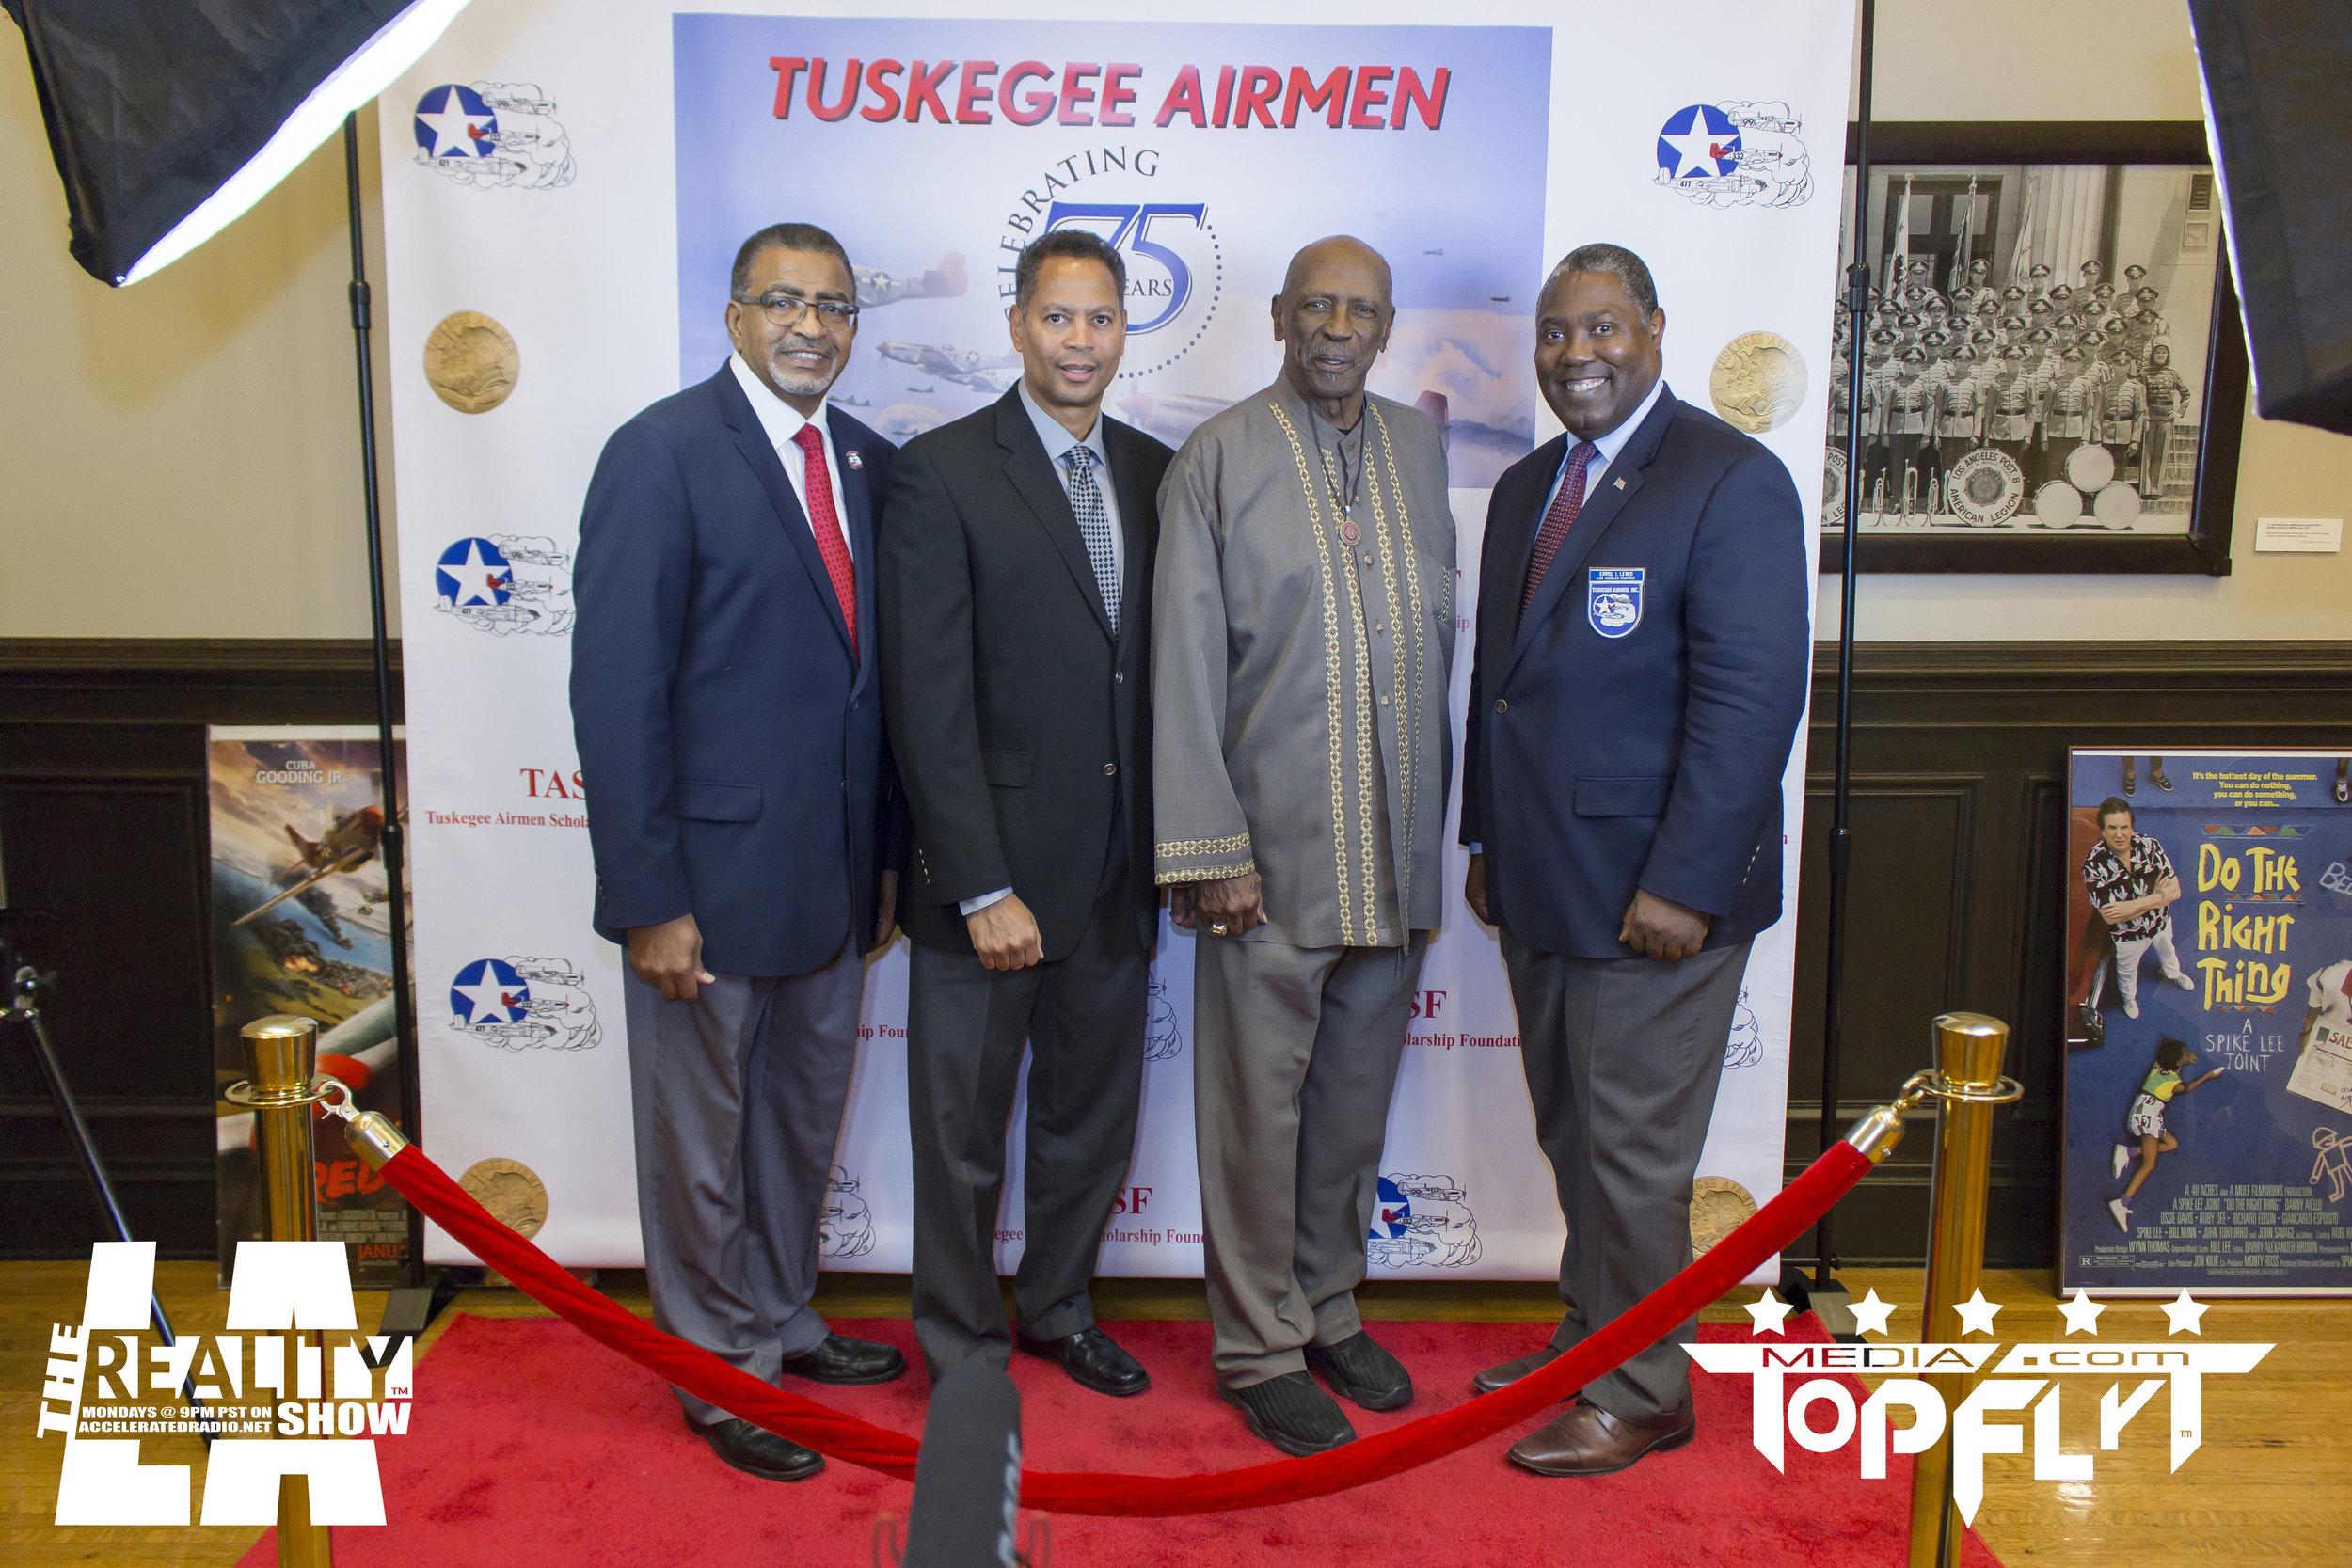 The Reality Show LA - Tuskegee Airmen 75th Anniversary VIP Reception_69.jpg